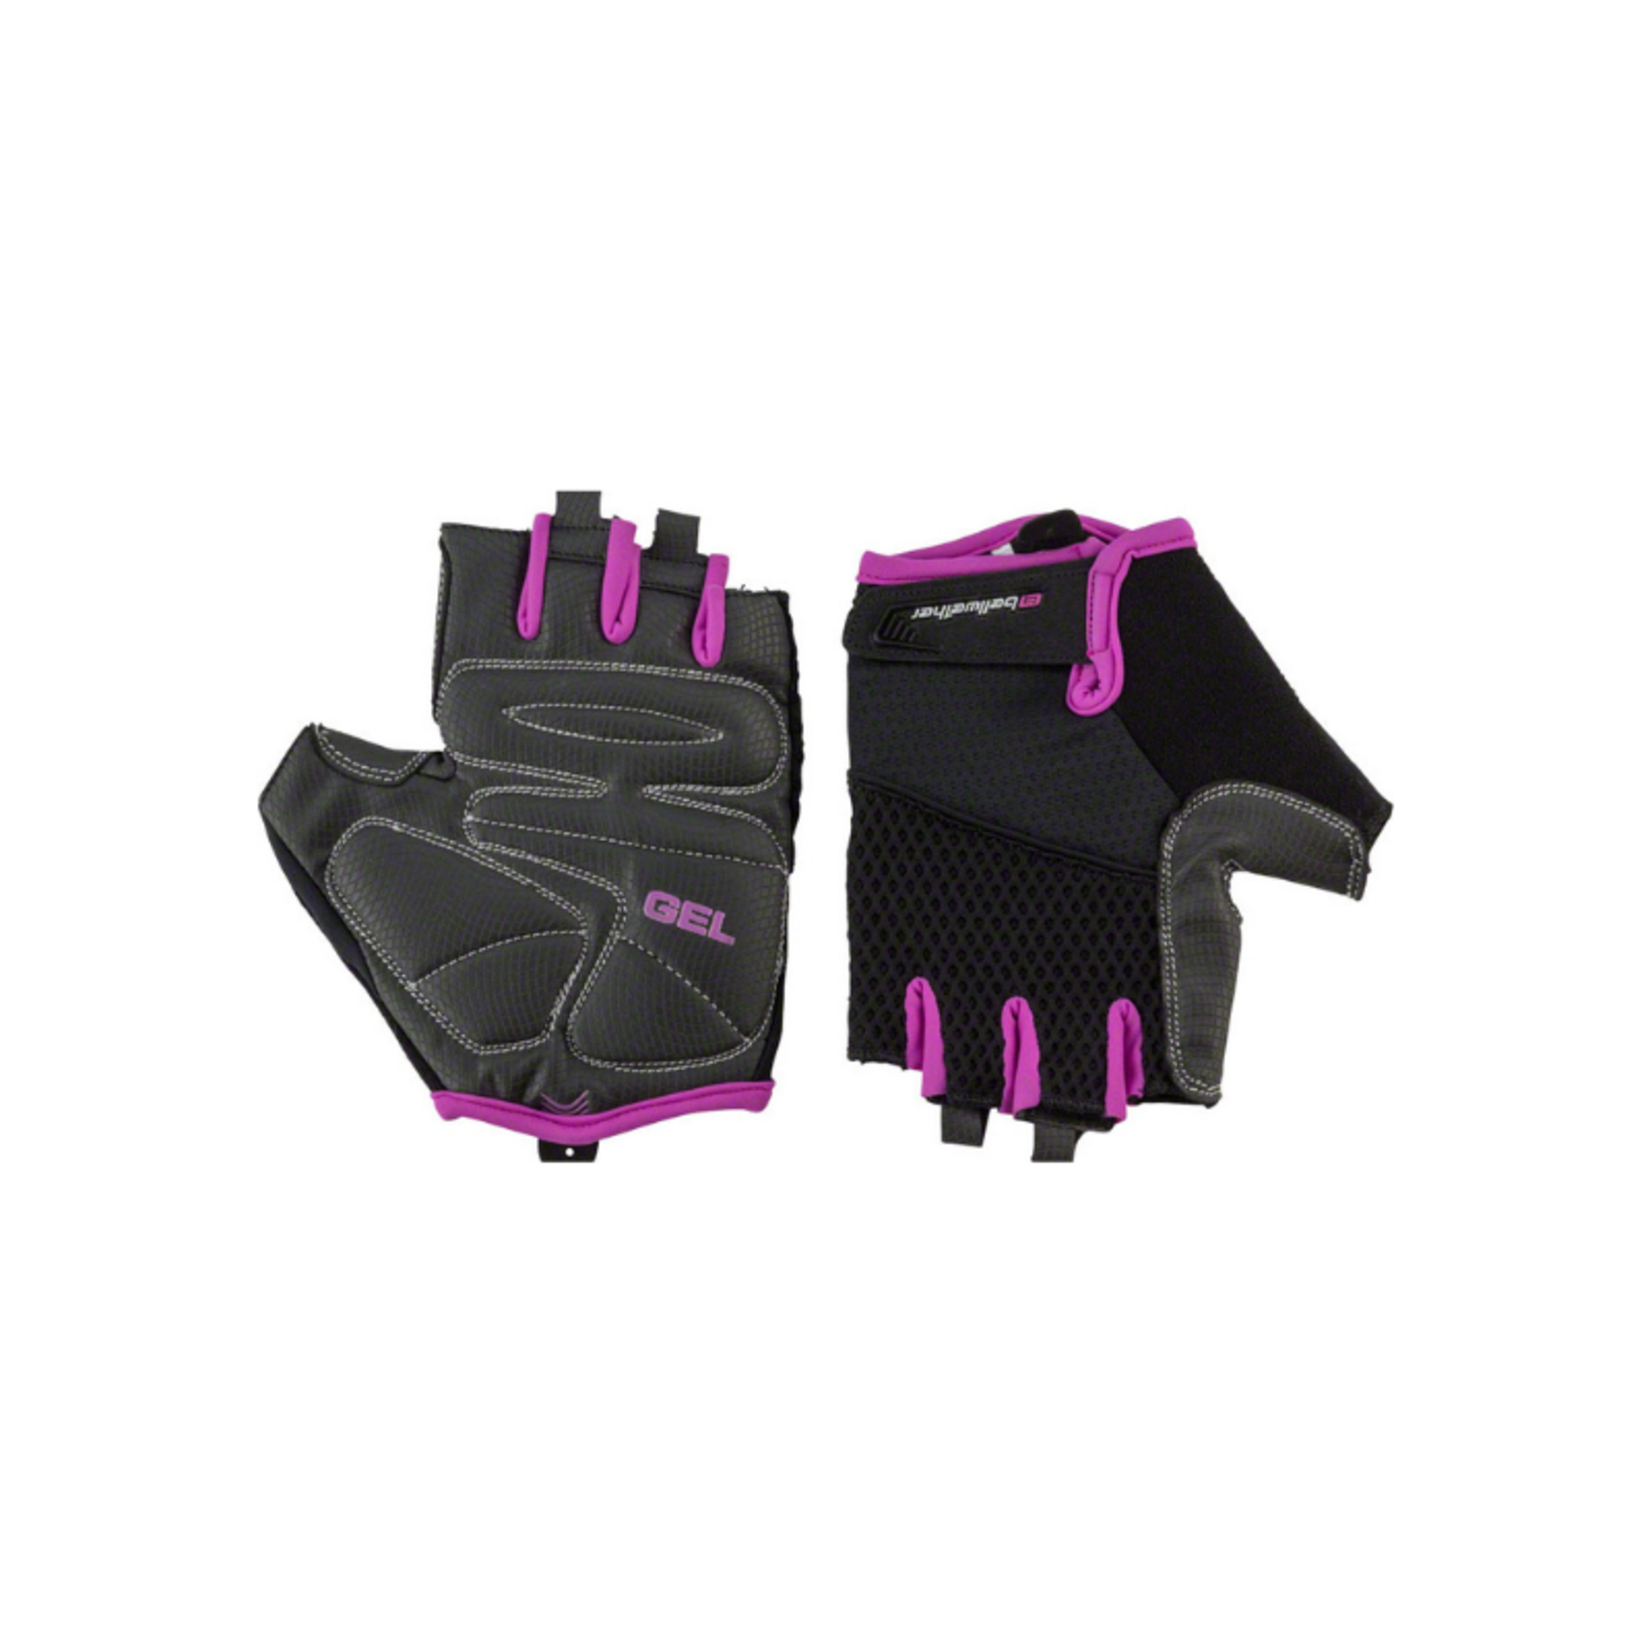 Bellwether Gloves Women's Gel Supreme